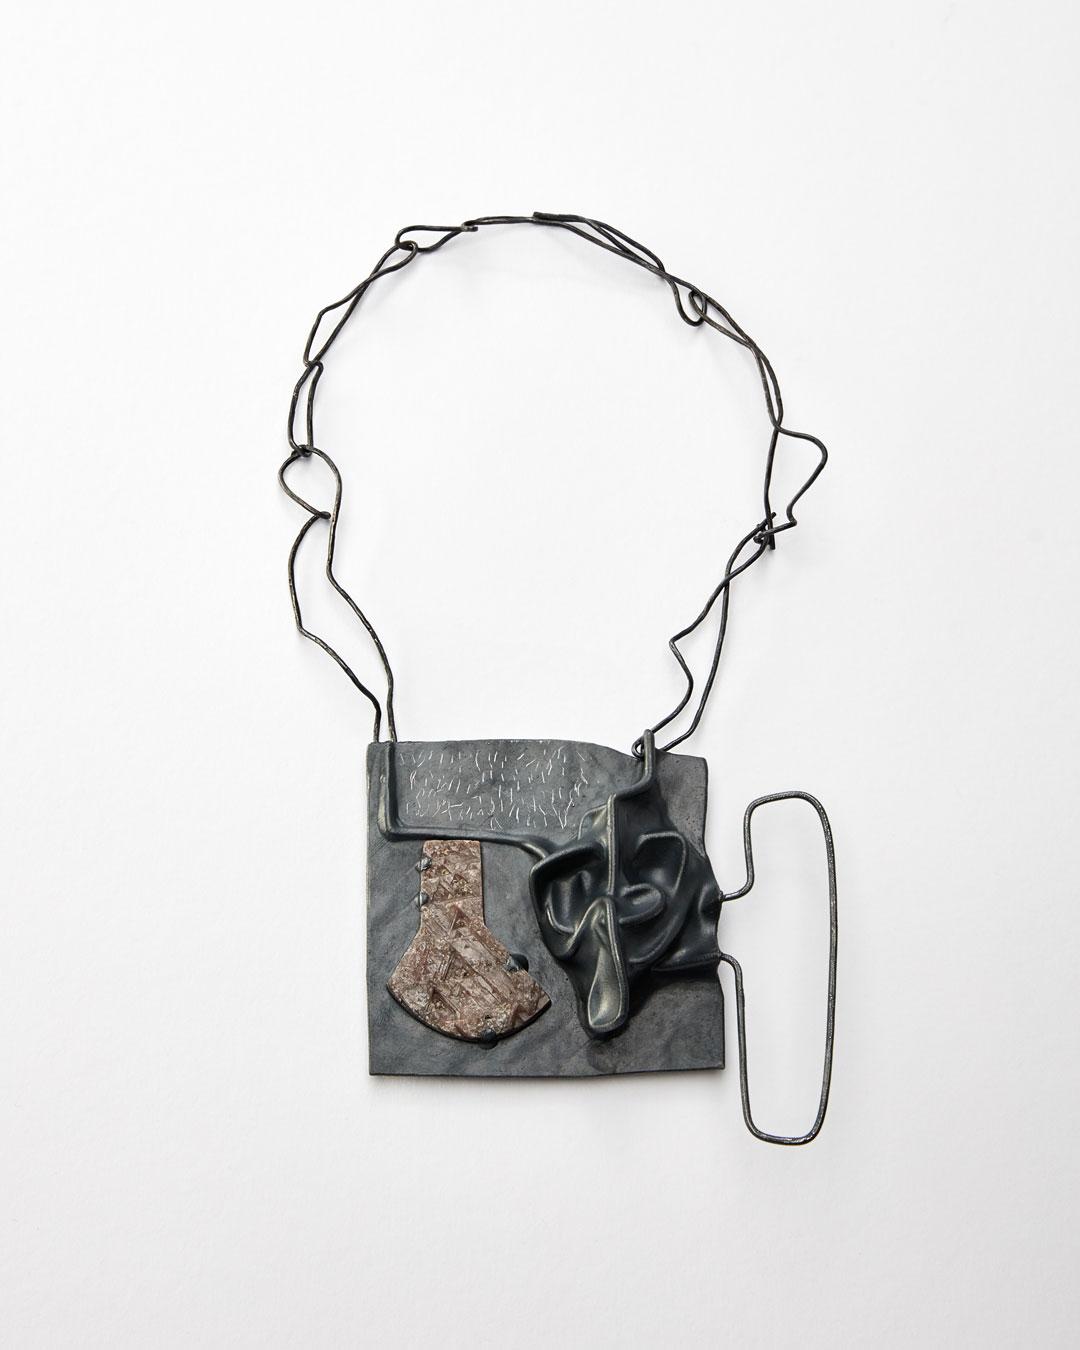 Iris Bodemer, Klang 1 (Sound 1), 2019, pendant; silver, thermoplastic, sapphire, 105 x 115 x 25 mm, €4250